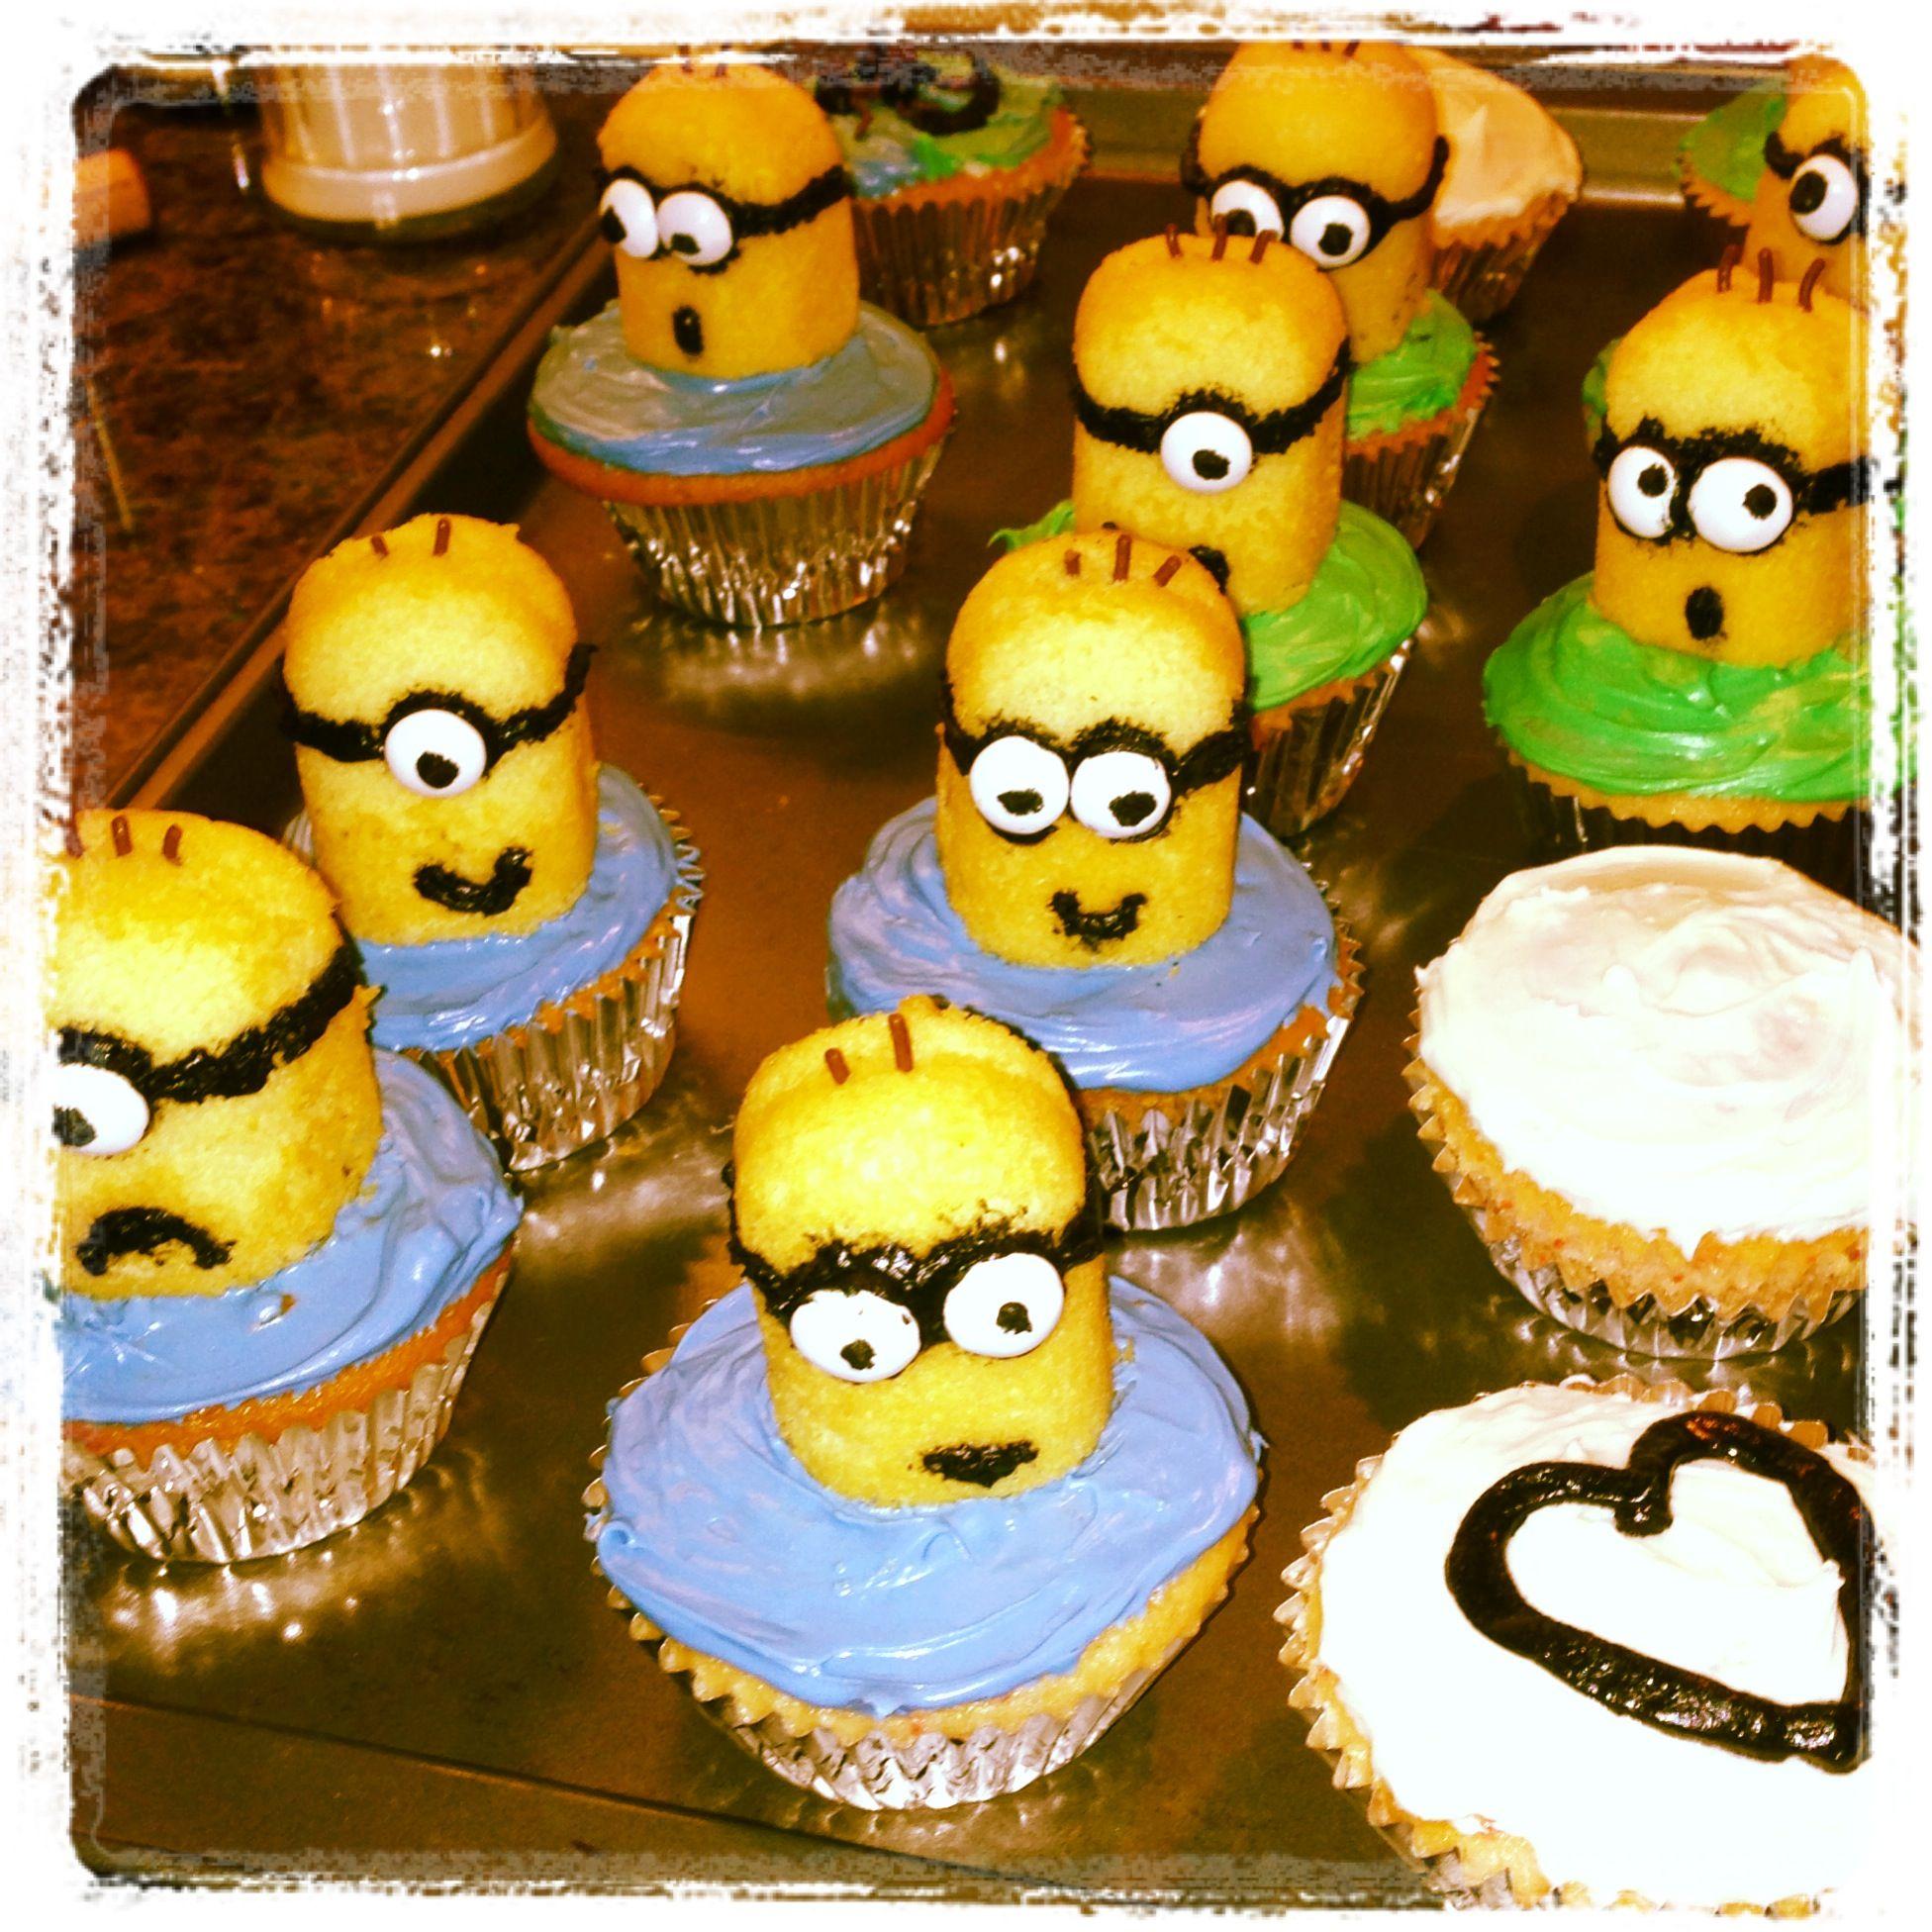 Cupcake Home Decor: Minion Cupcakes! Cake Mix, Twinkies, Sprinkles, Food